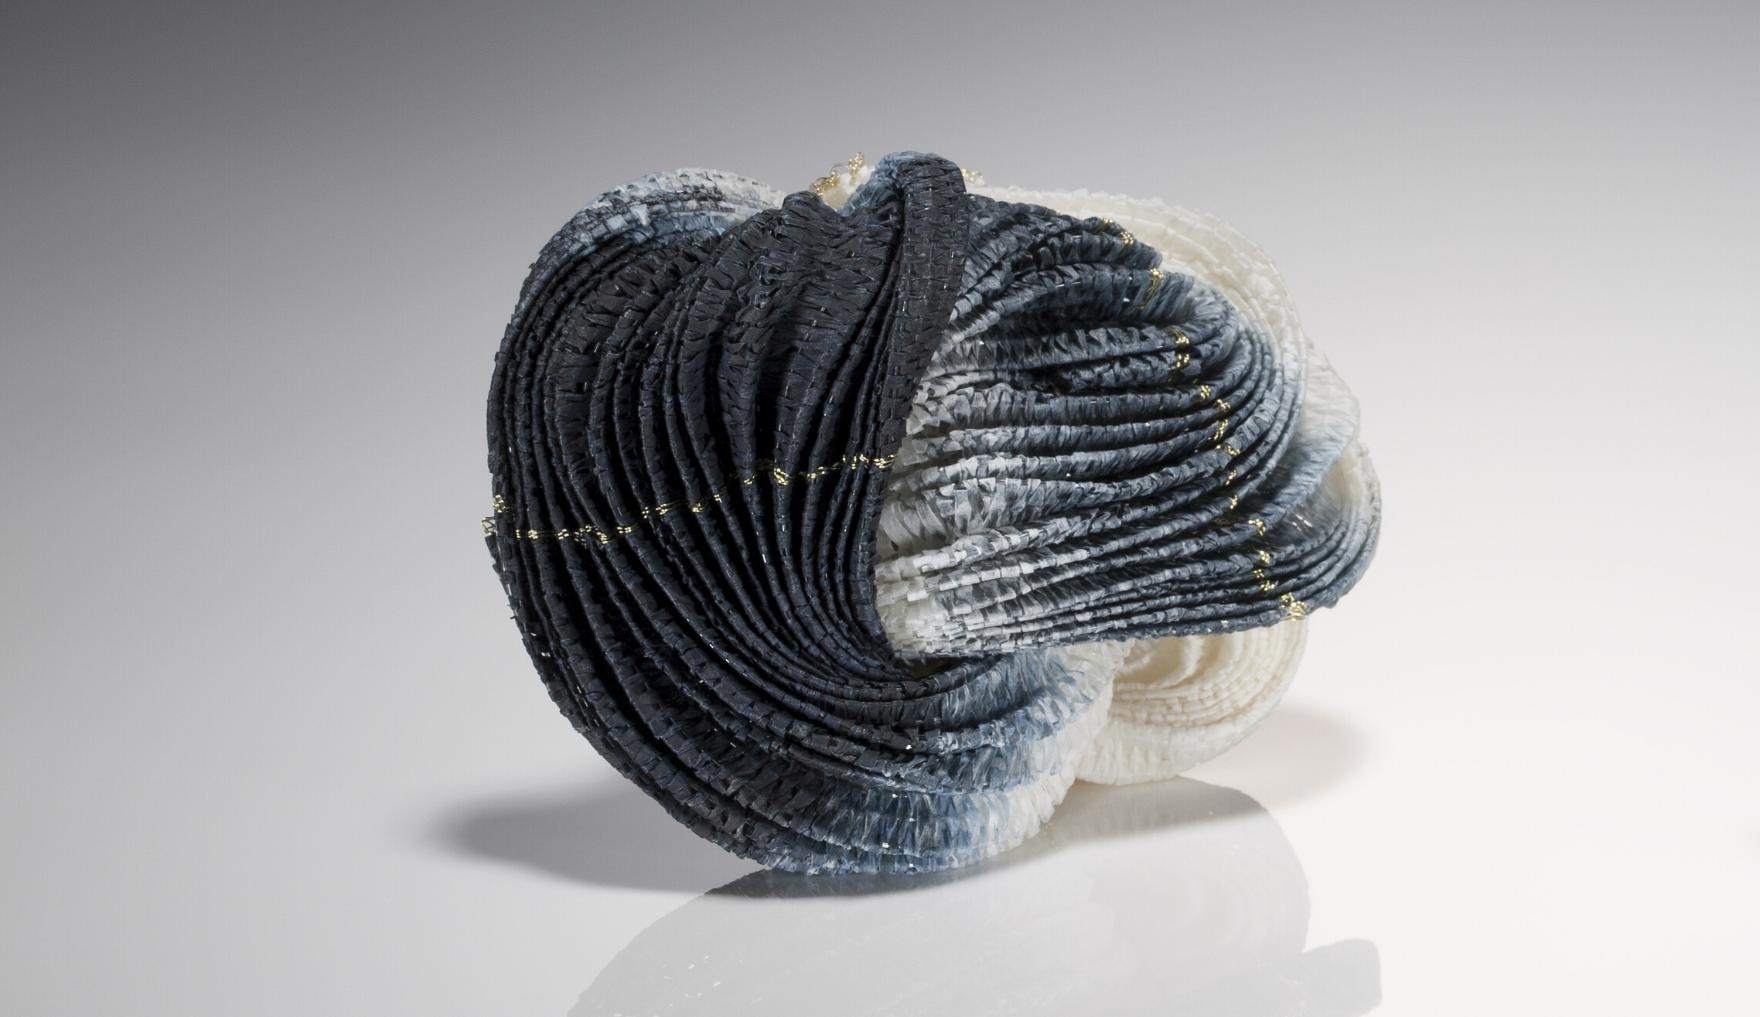 Kazumi Nagano, Dark brooch, wearable art, Thereza Pedrosa gallery, Asolo